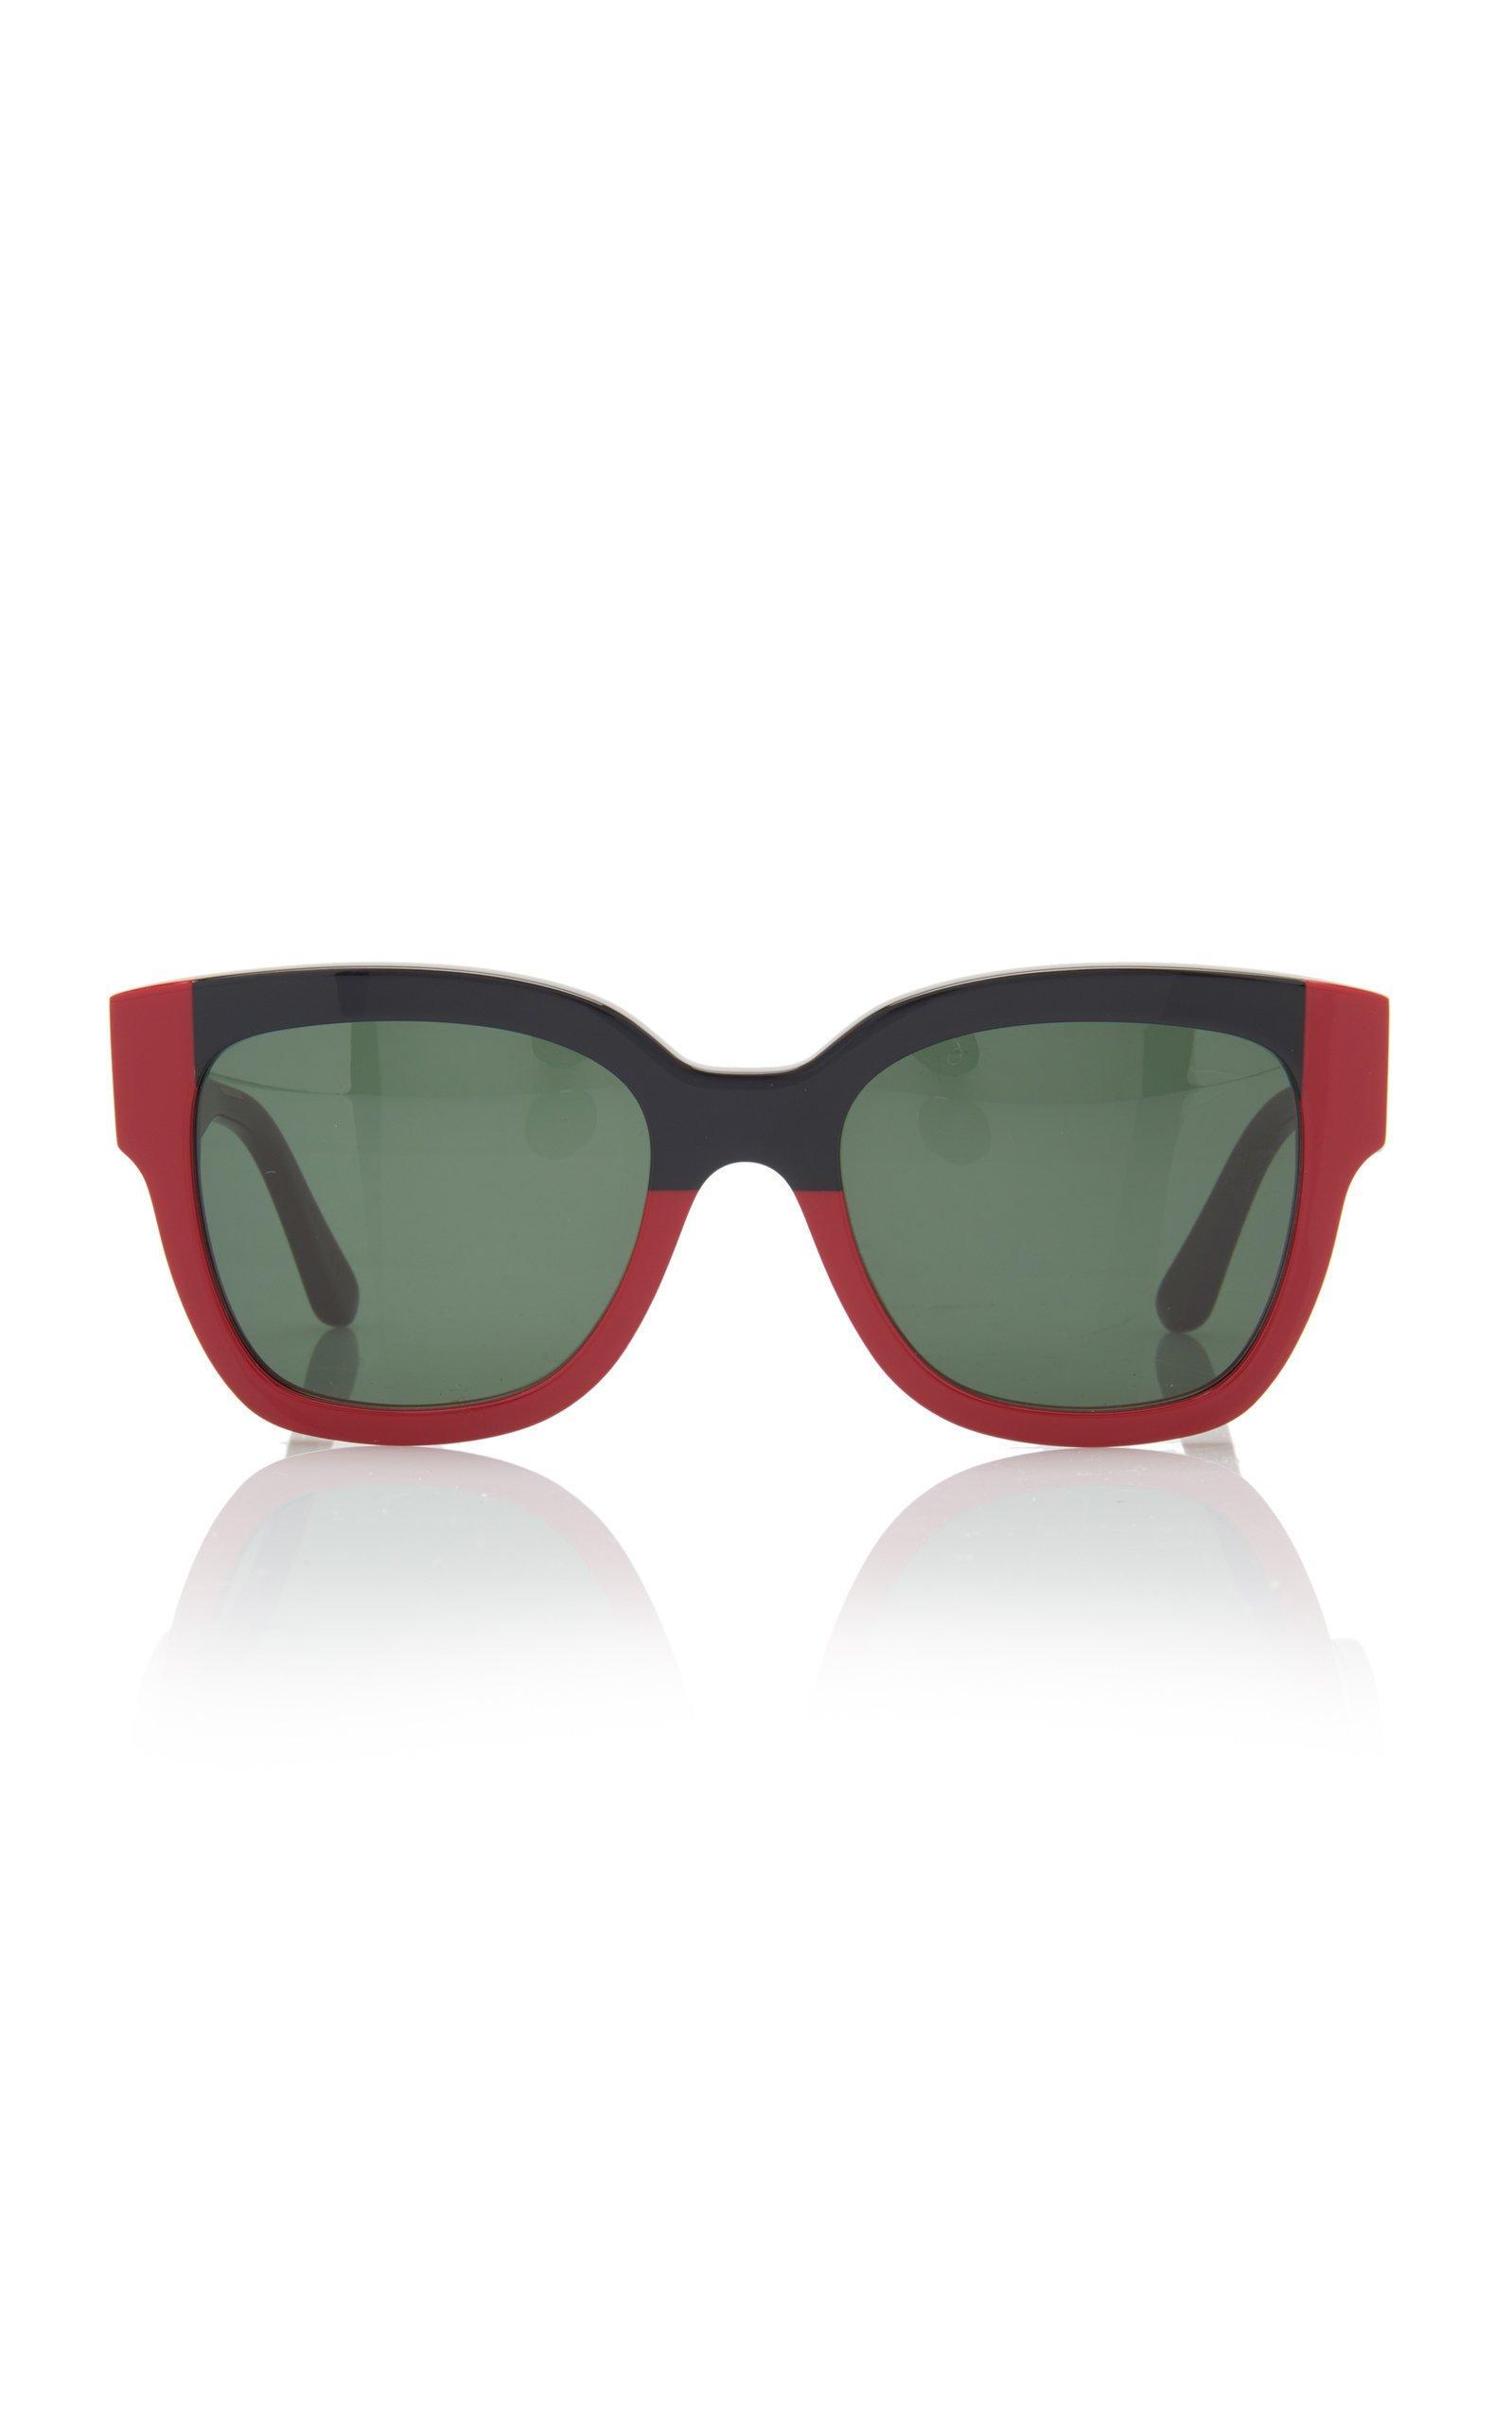 Marni Colorblocked Square Frame Sunglasses